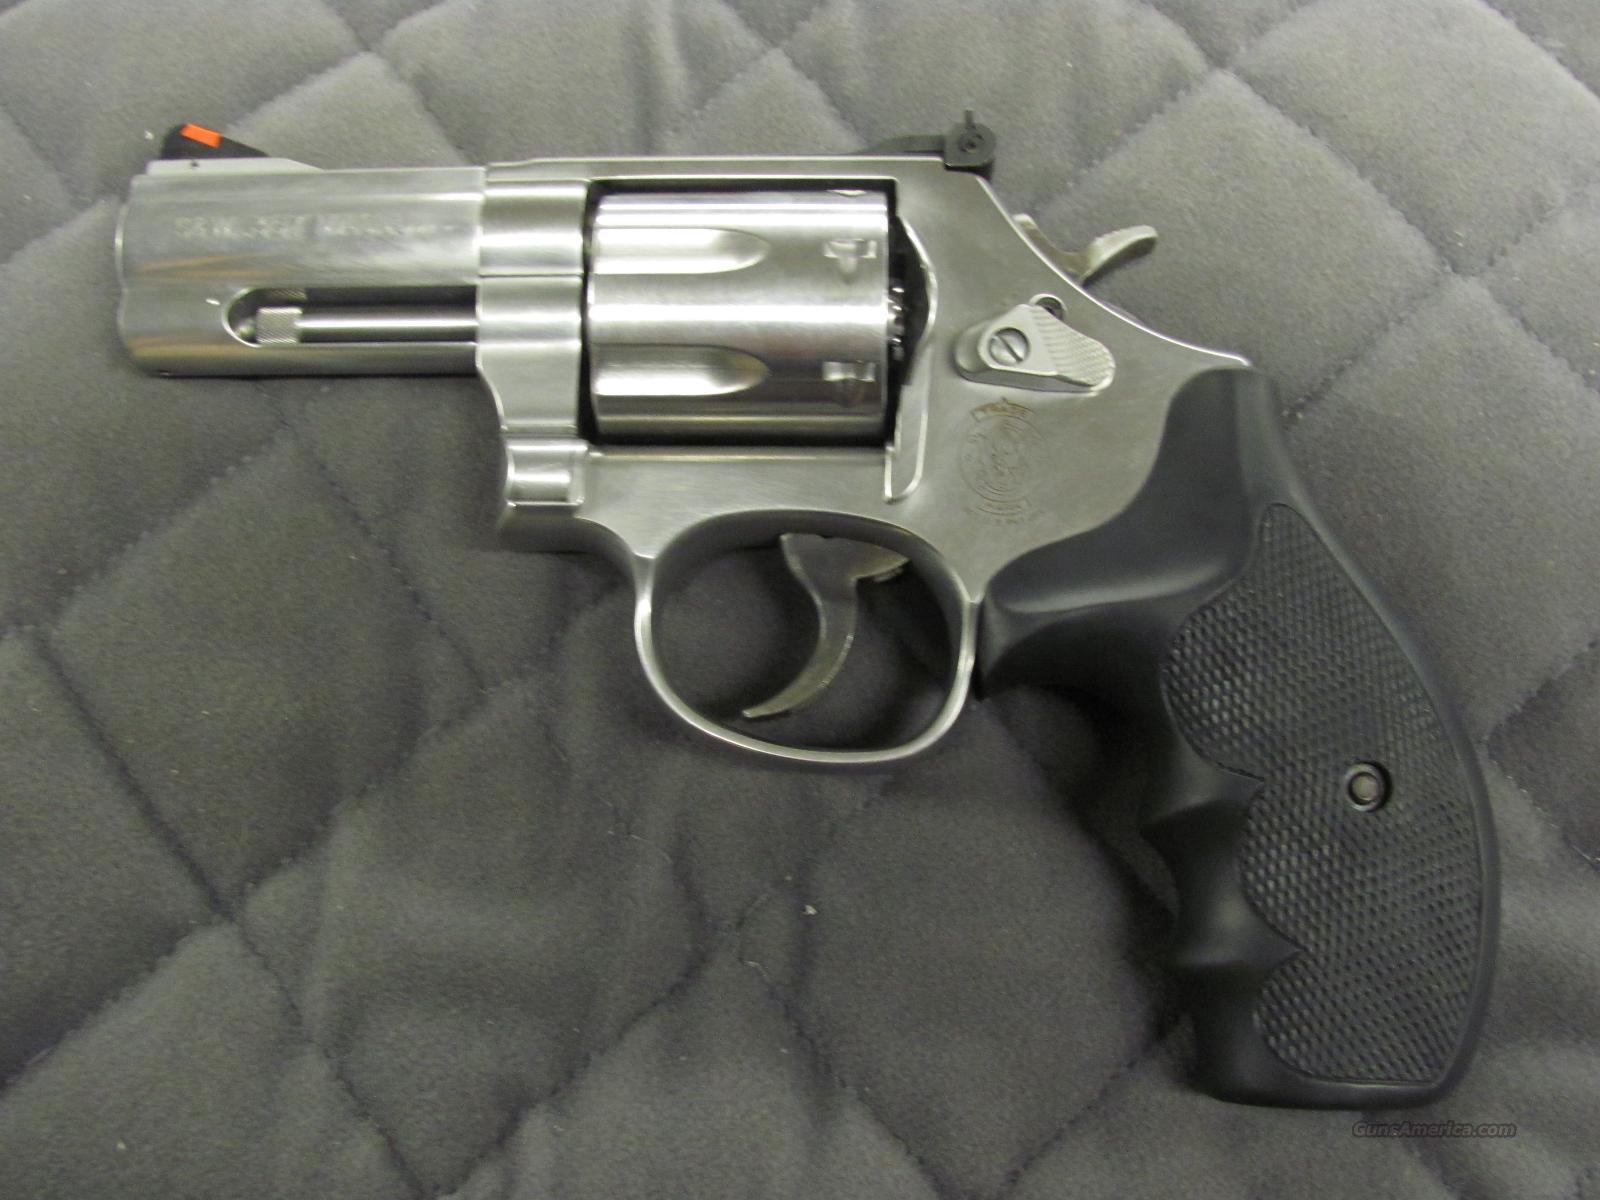 Smith & Wesson Model 686 Plus 3 inch 7 shot 357 Mag  **NEW**  Guns > Pistols > Smith & Wesson Revolvers > Full Frame Revolver